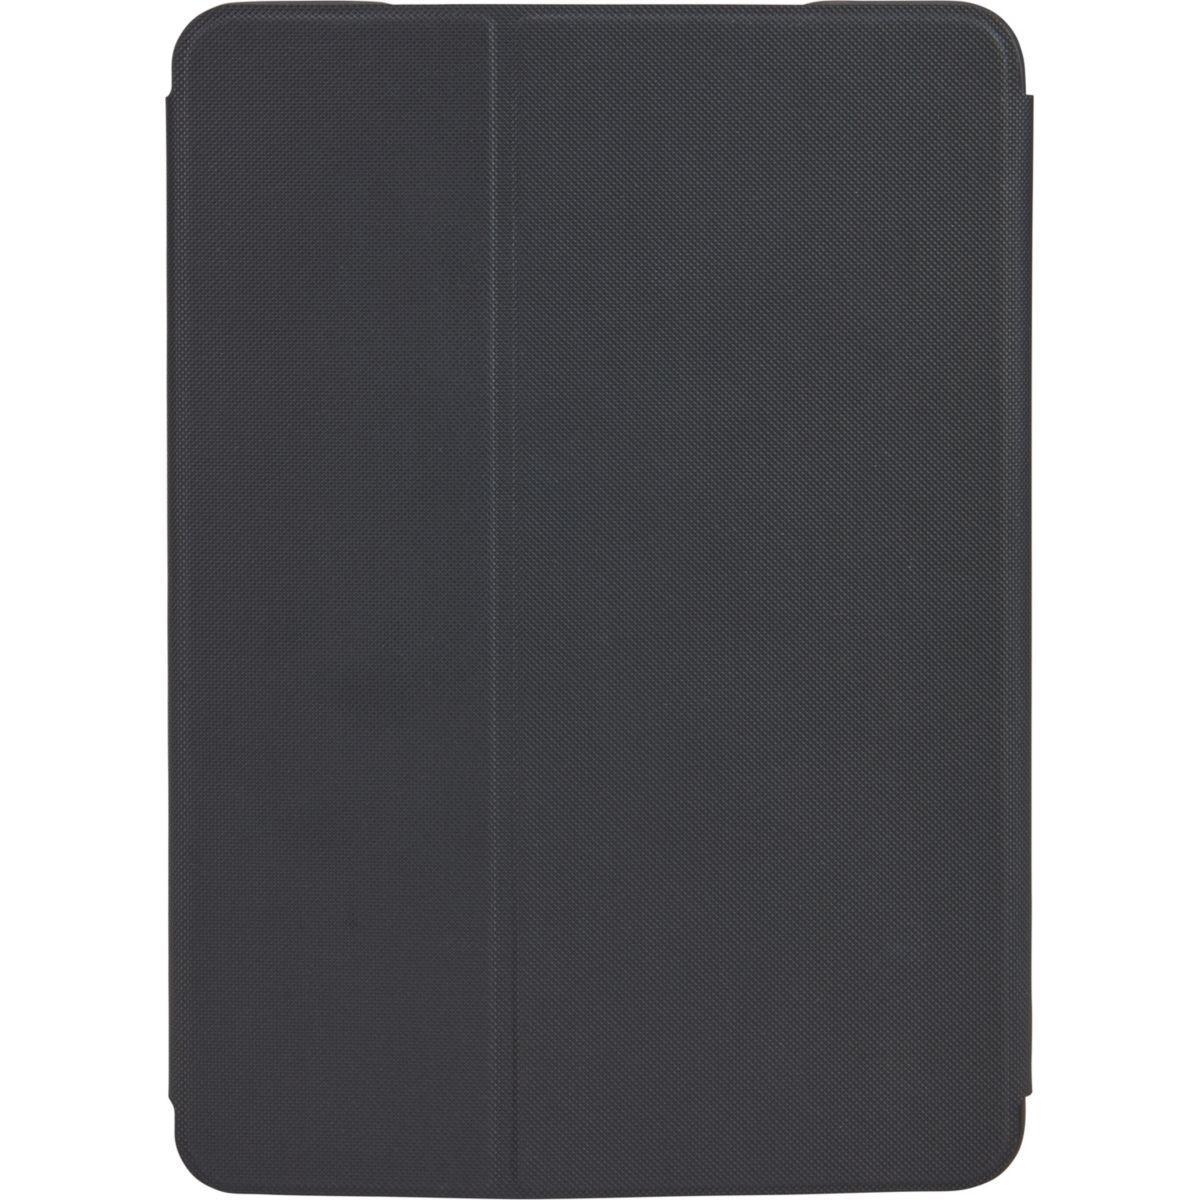 Folio caselogic new ipad noir - 20% de remise immédiate avec le code : multi20 (photo)